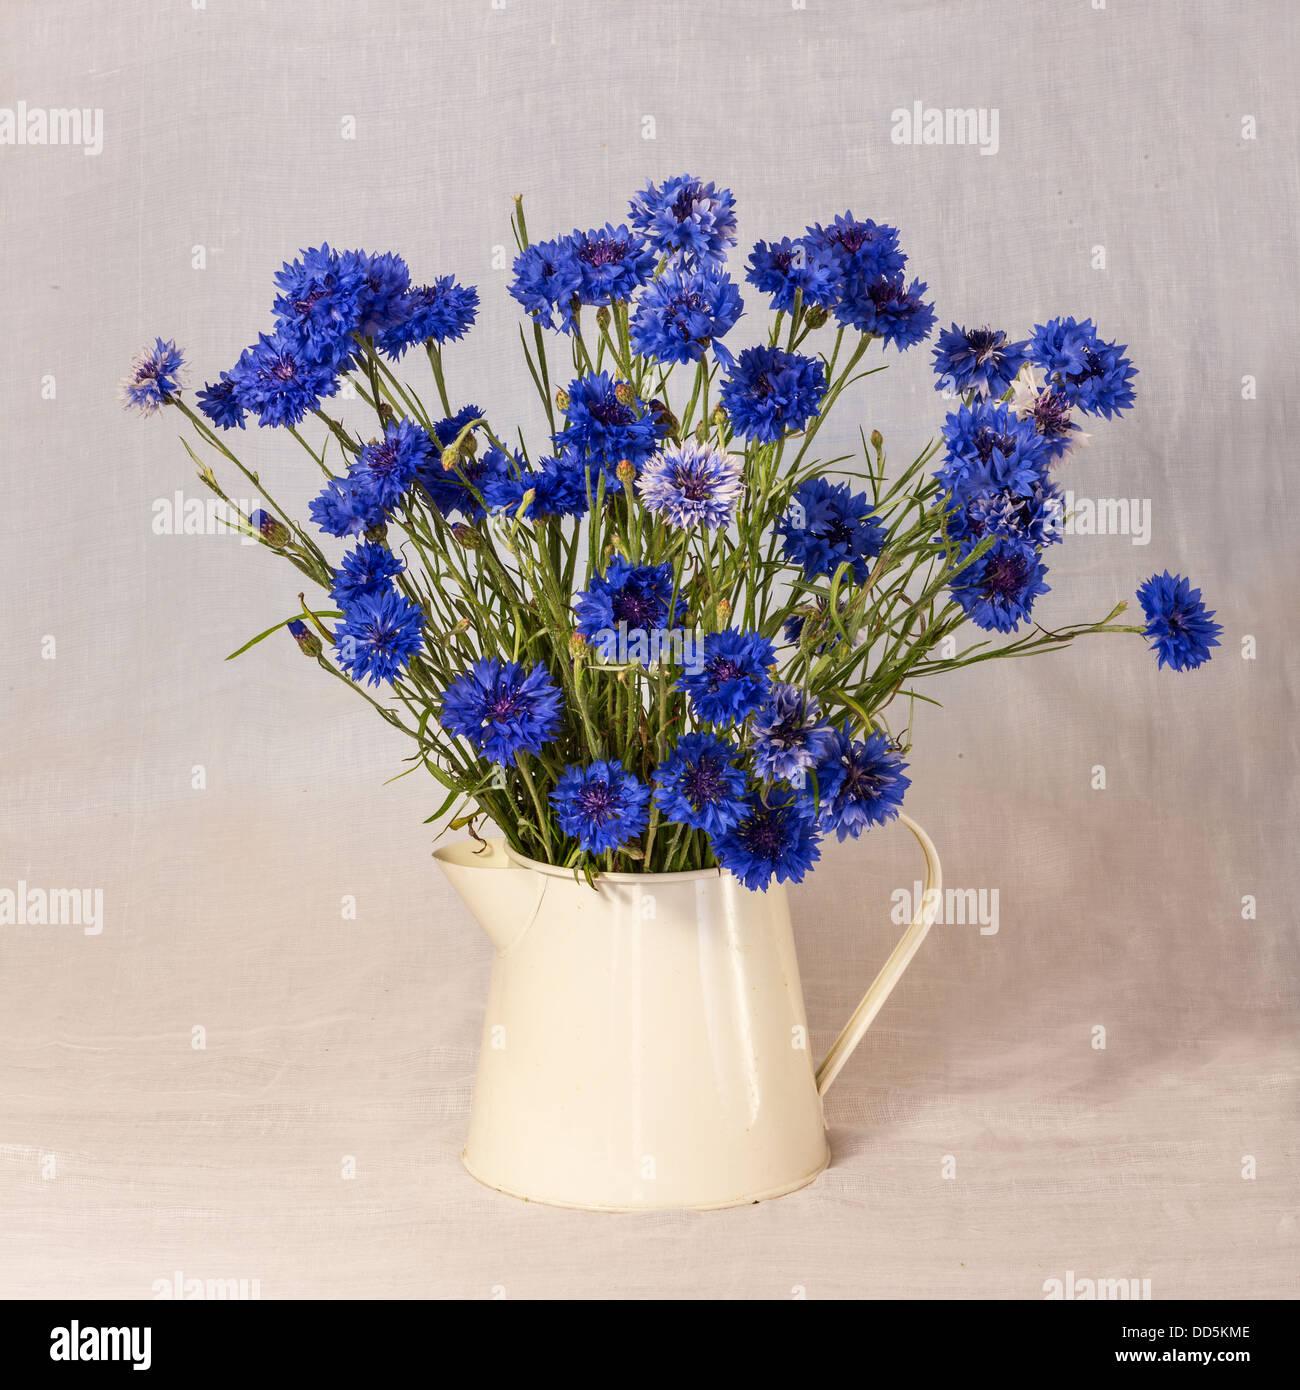 Jug of Cornflowers Stock Photo